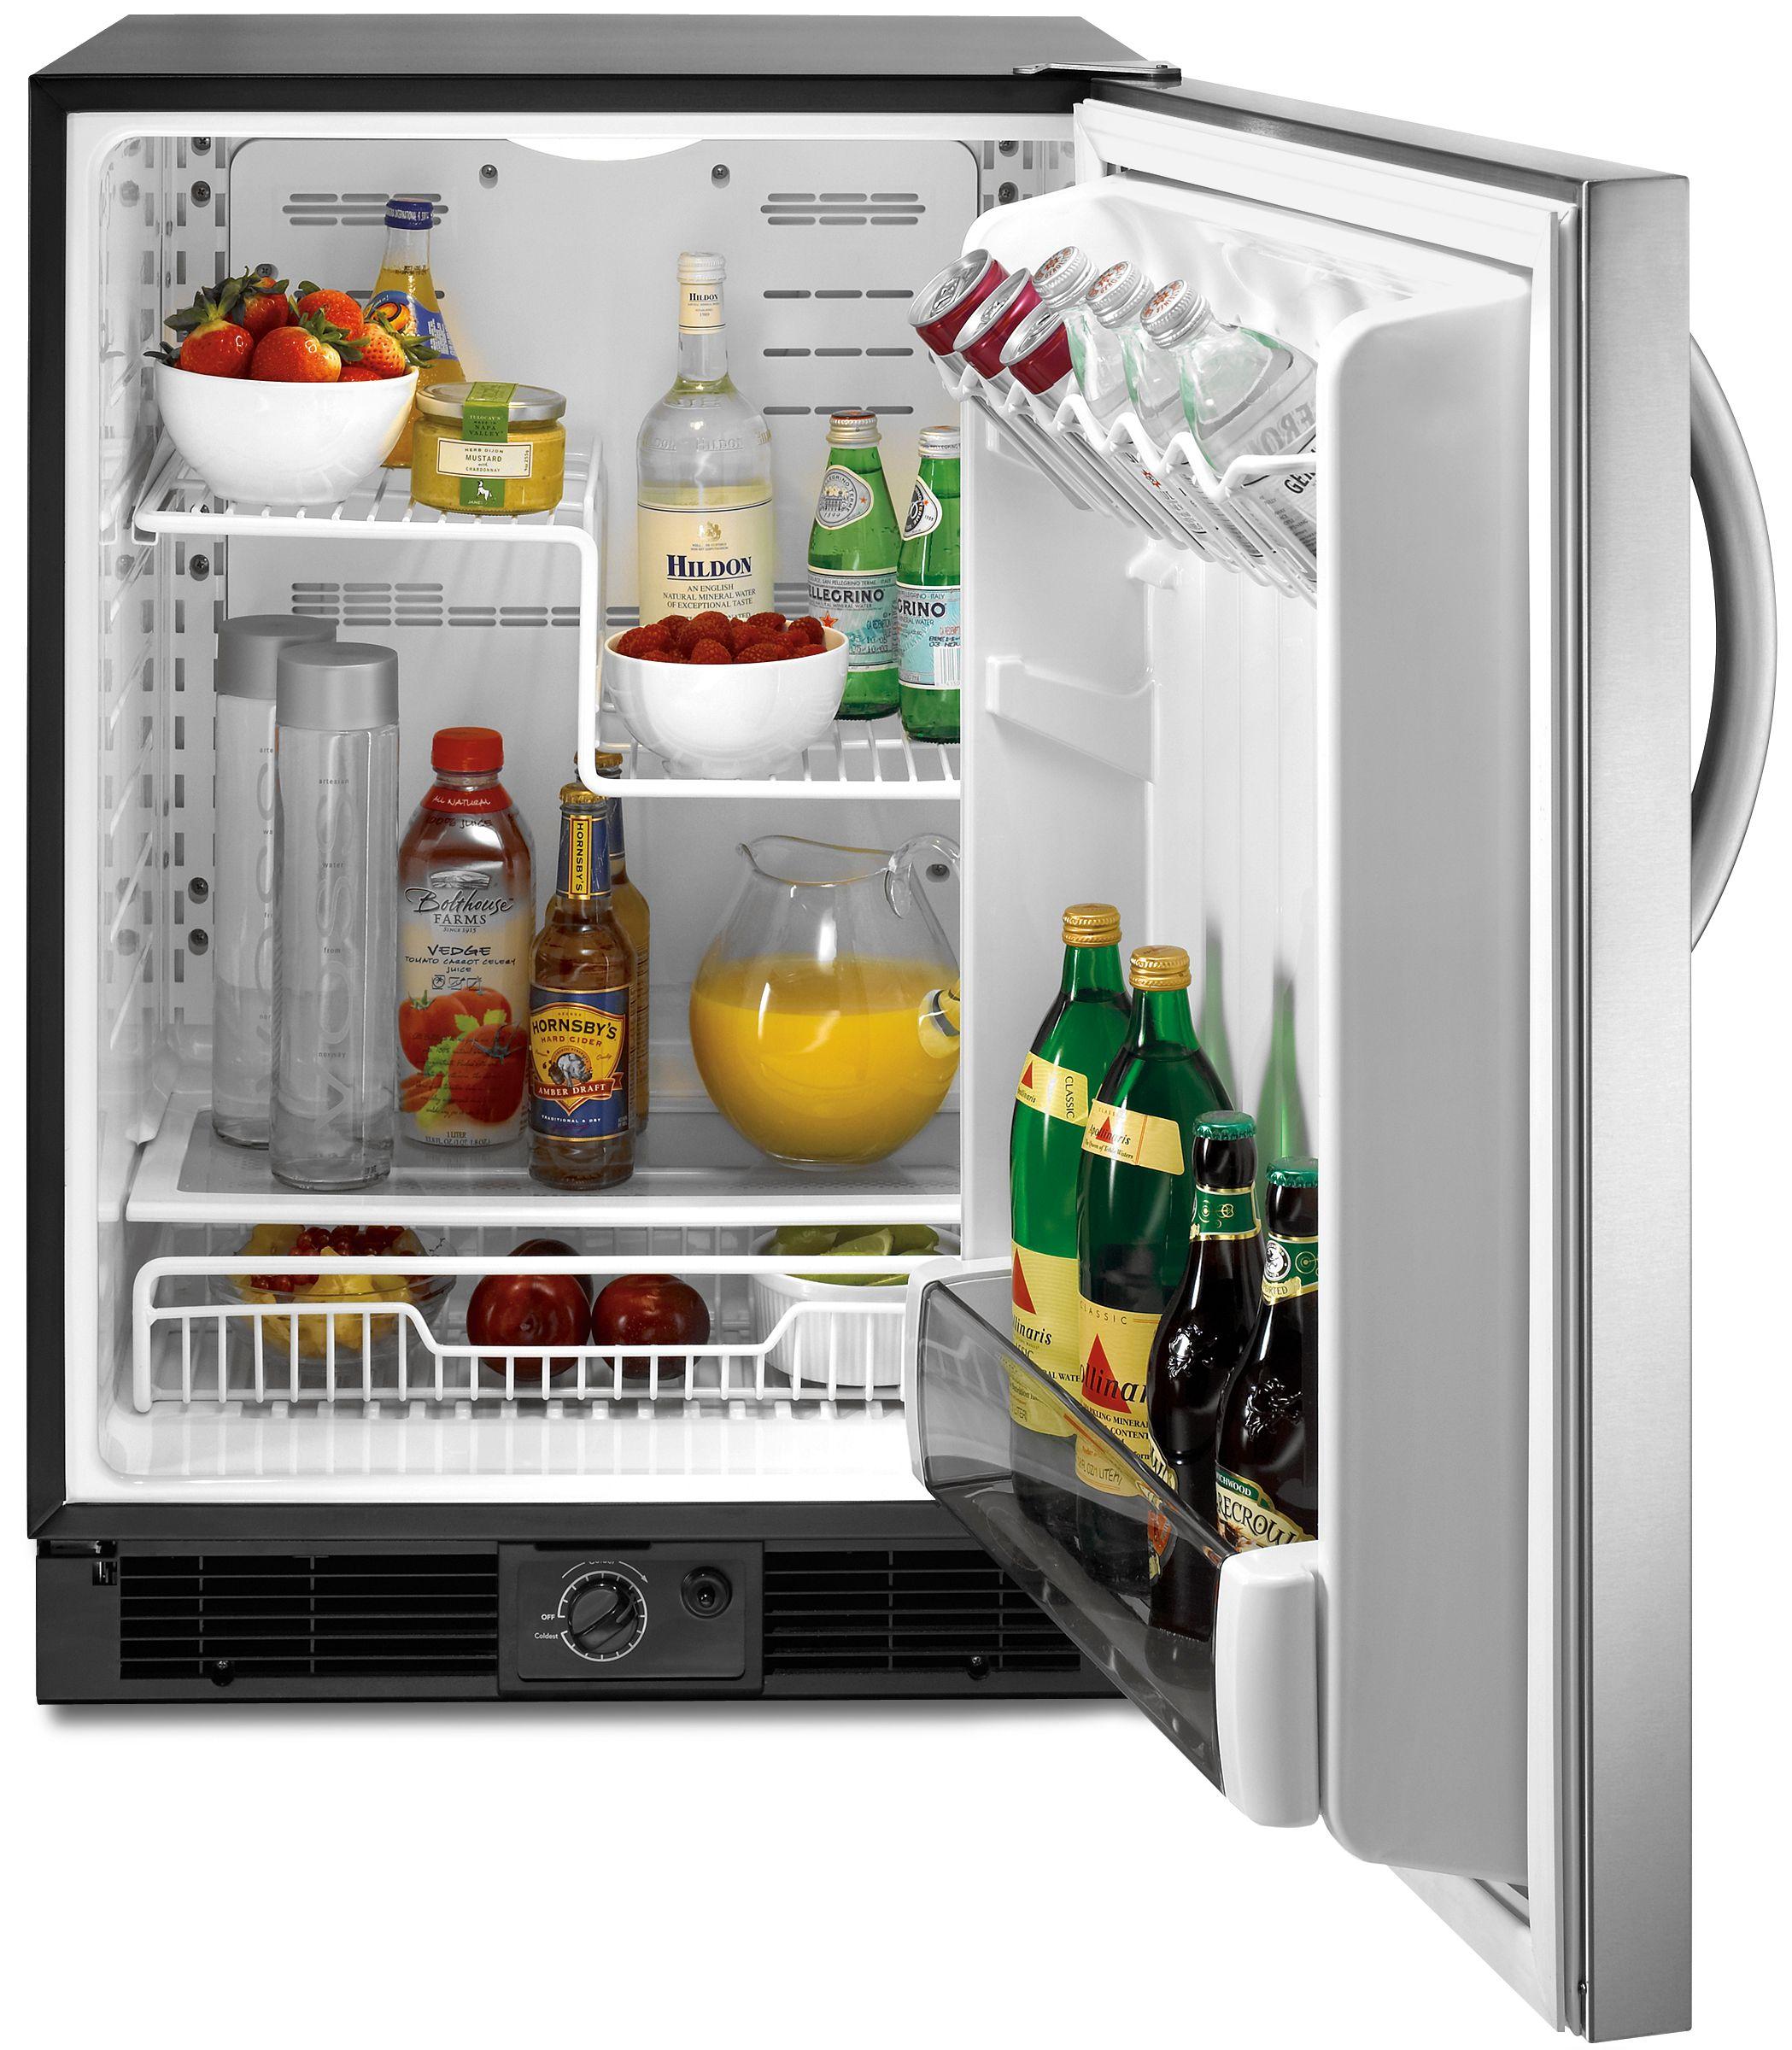 KitchenAid 5.7 cu. ft. Undercounter Refrigerator